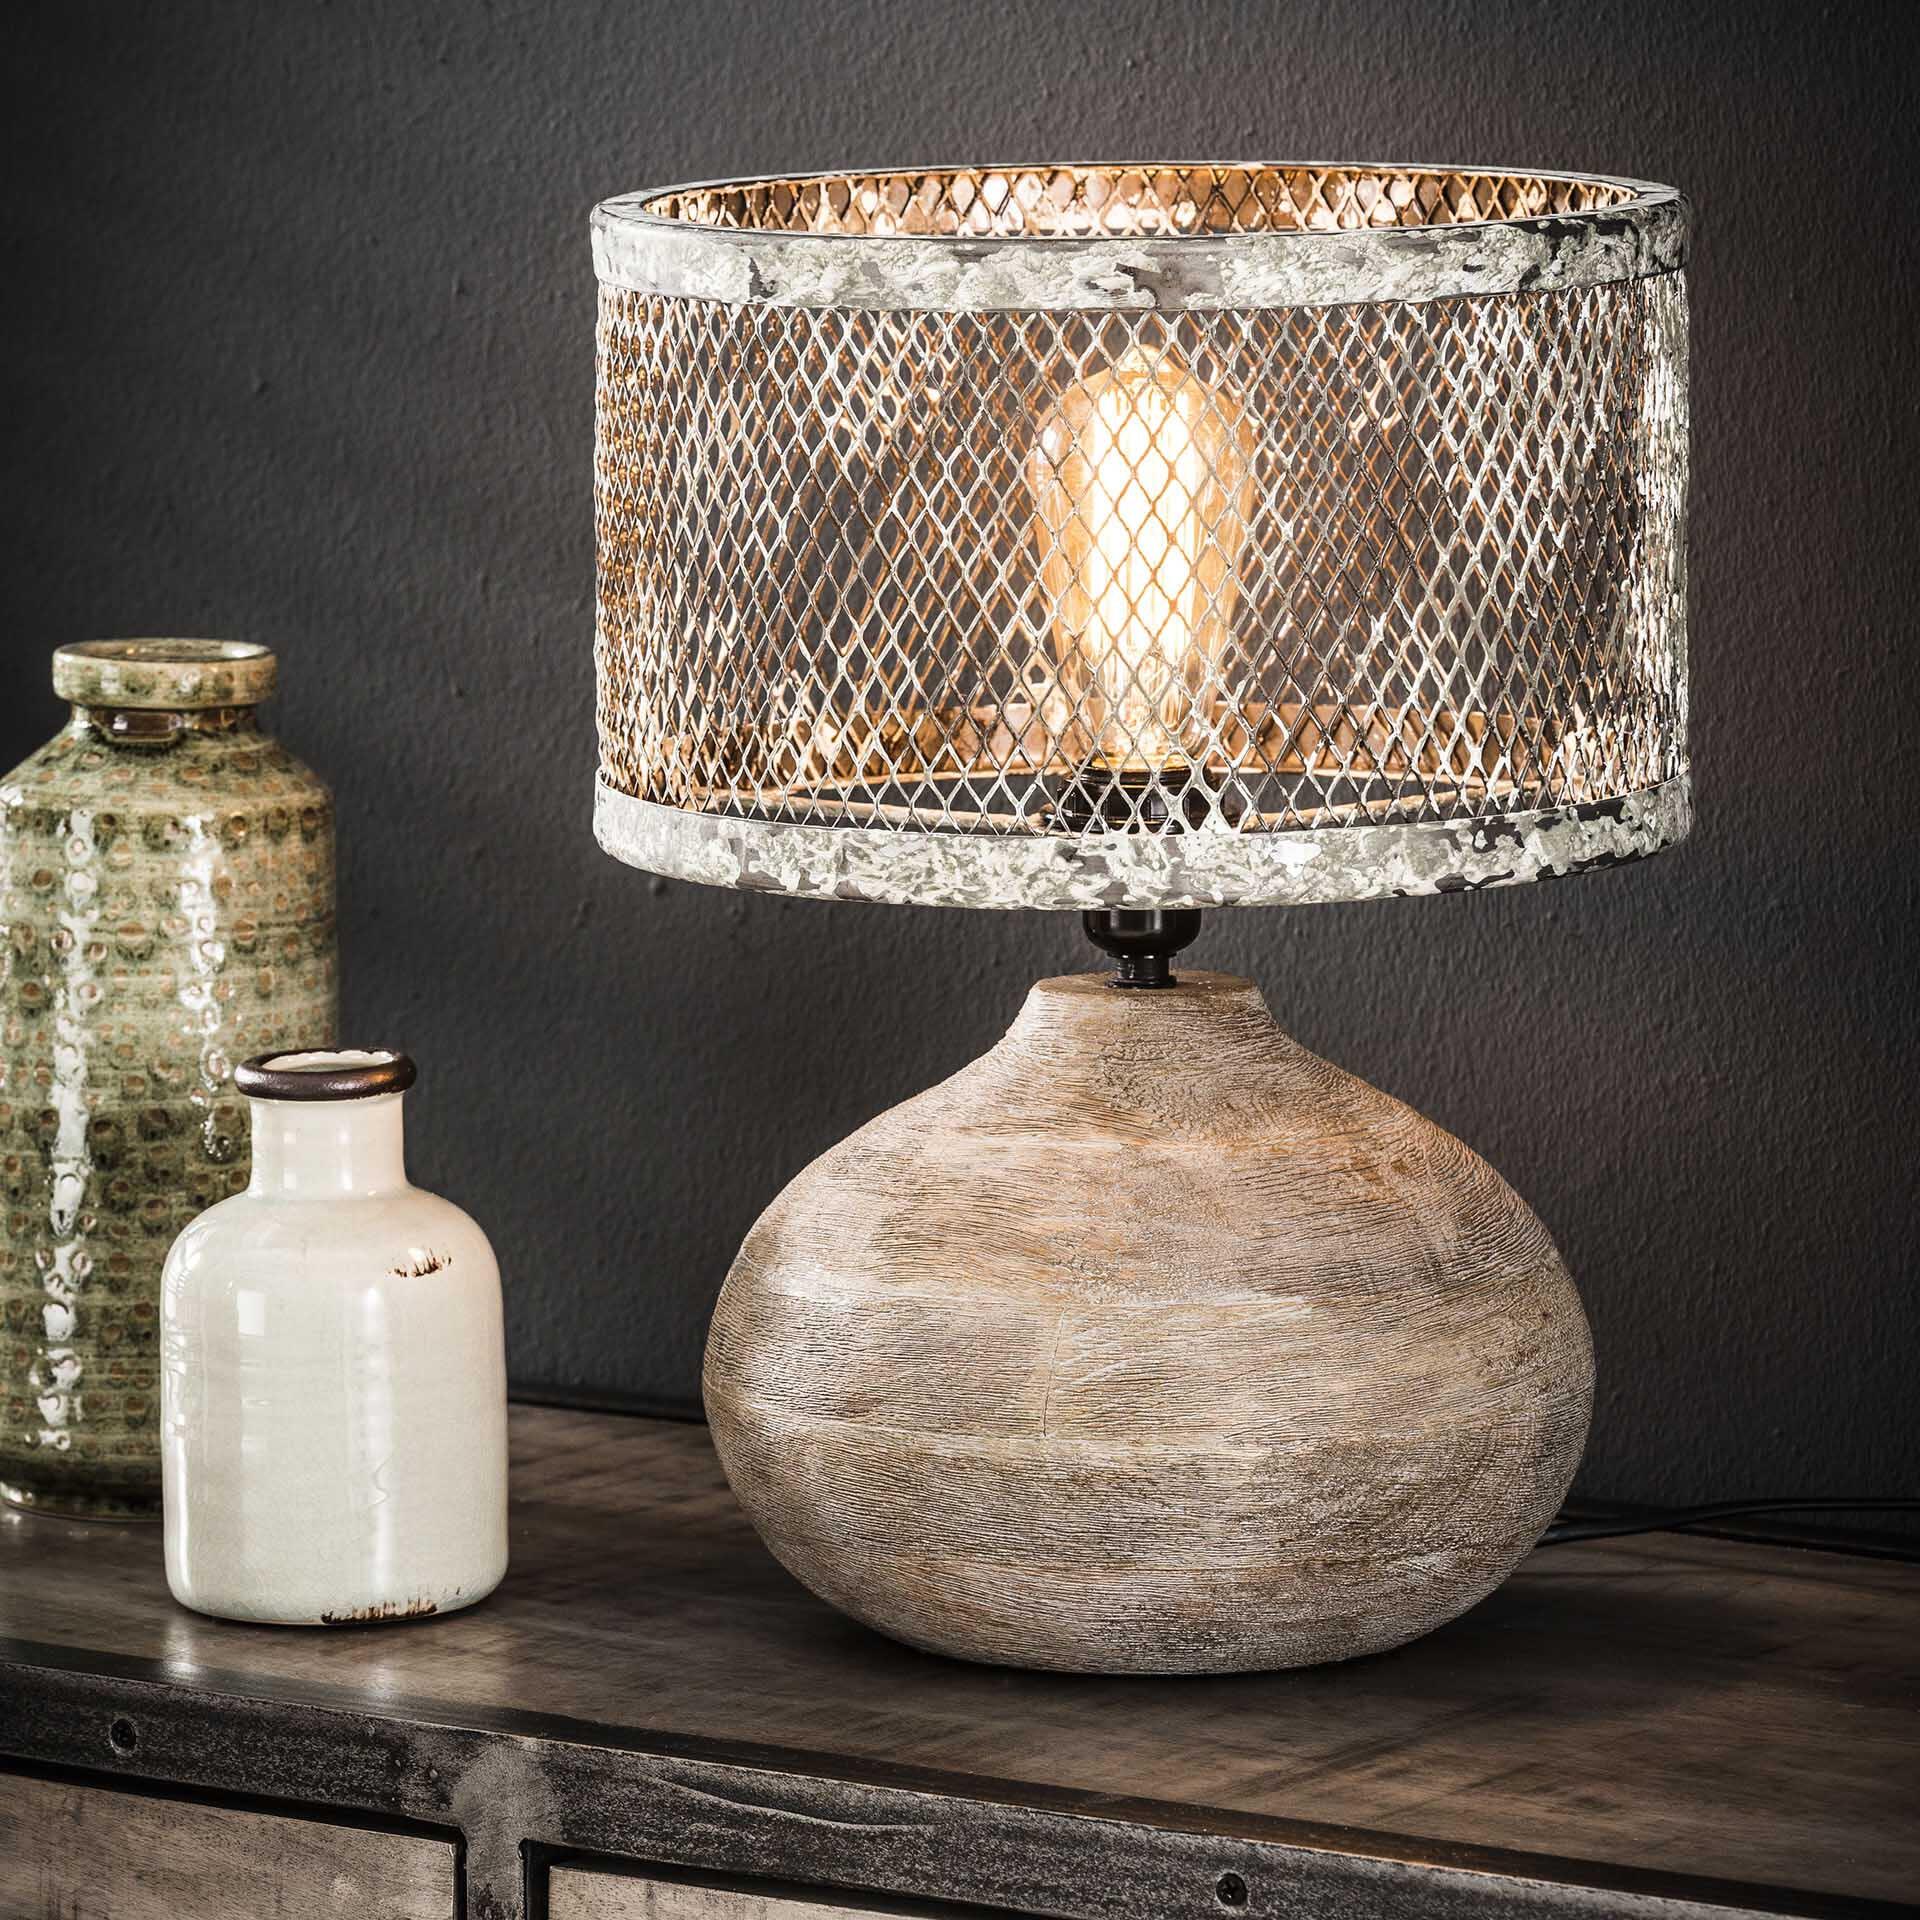 Tafellamp 'Cary' met houten voet, Ø31cm